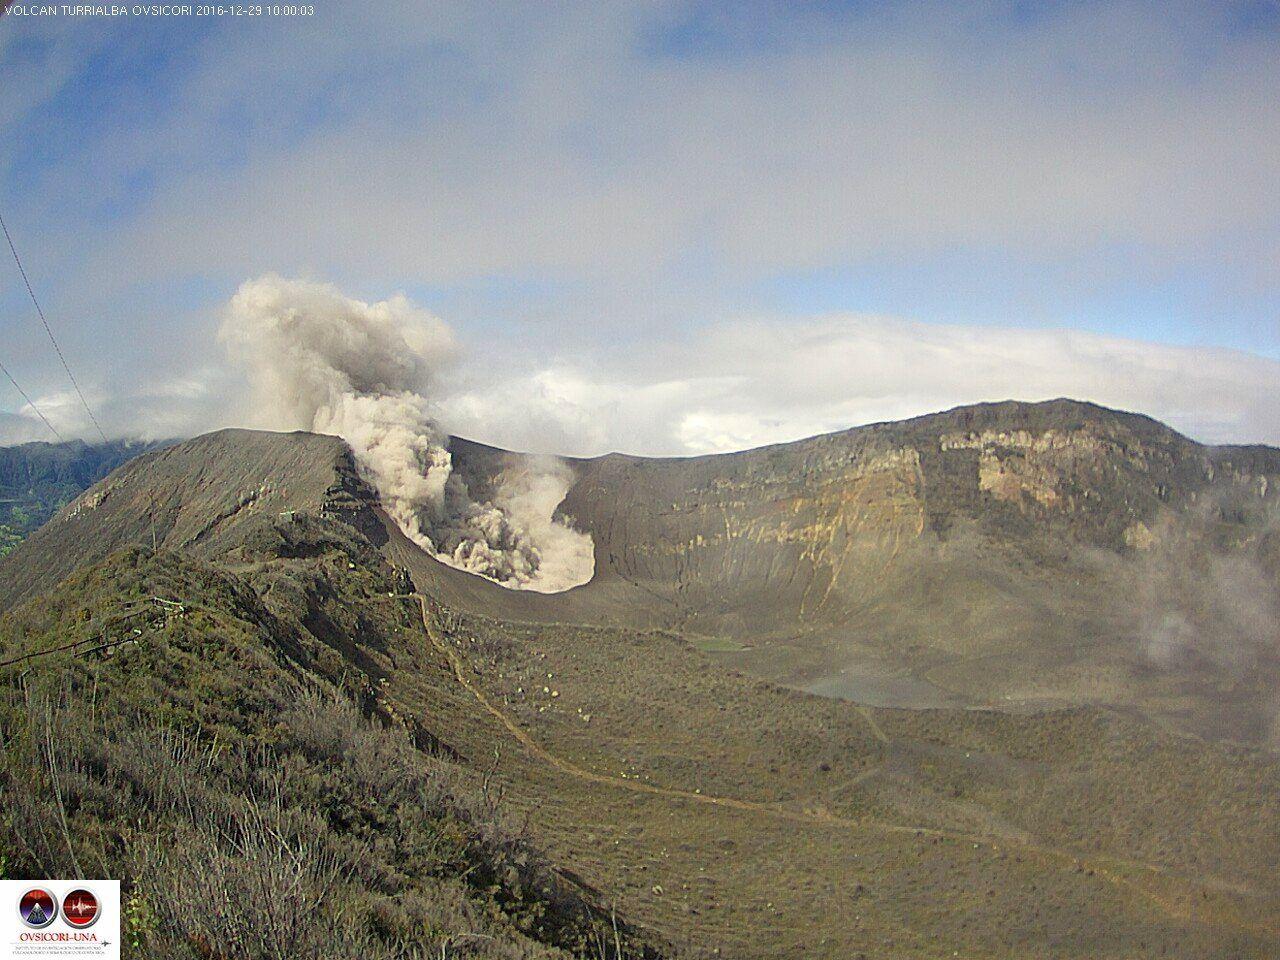 Turrialba - activity of 29.12.2016 / 10h - webcam Ovsicori